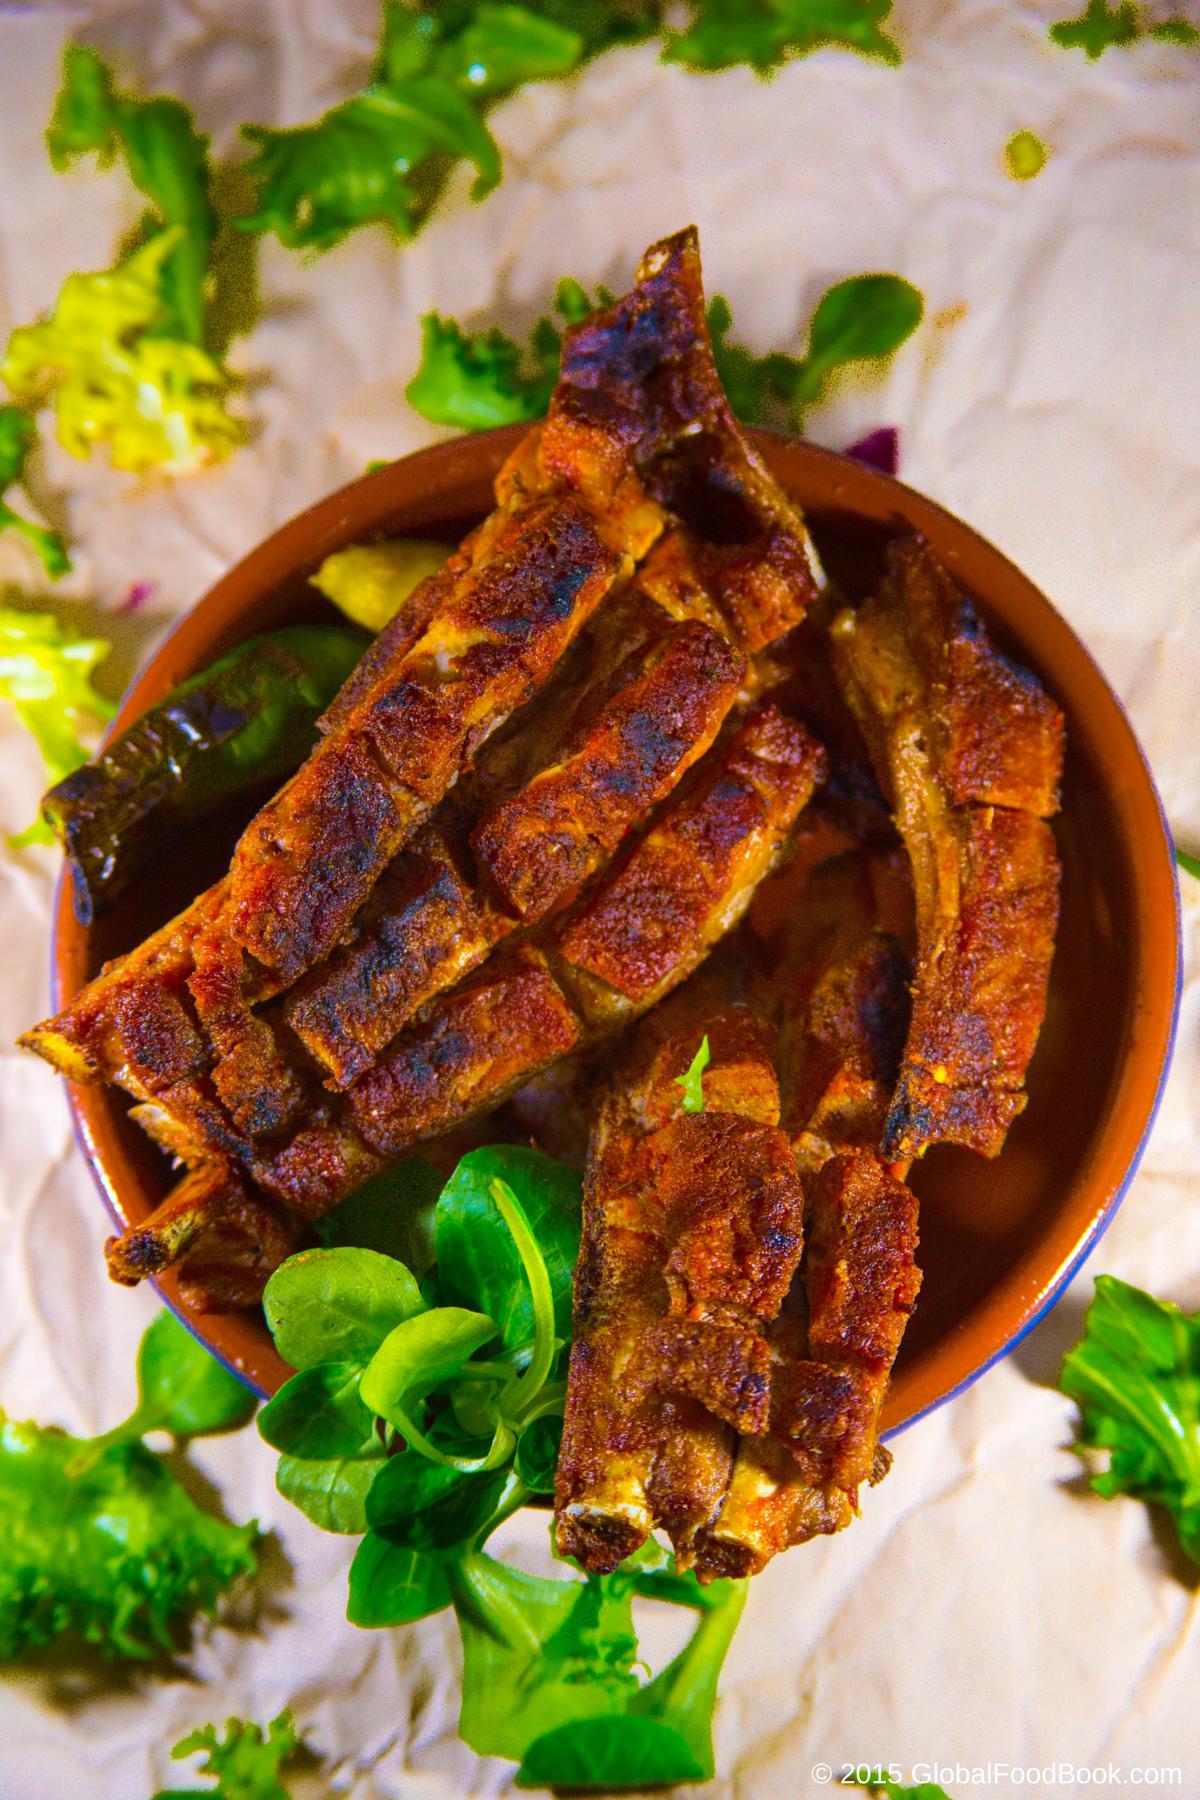 Lamb Ribs With Rhubarb And Radish Salad